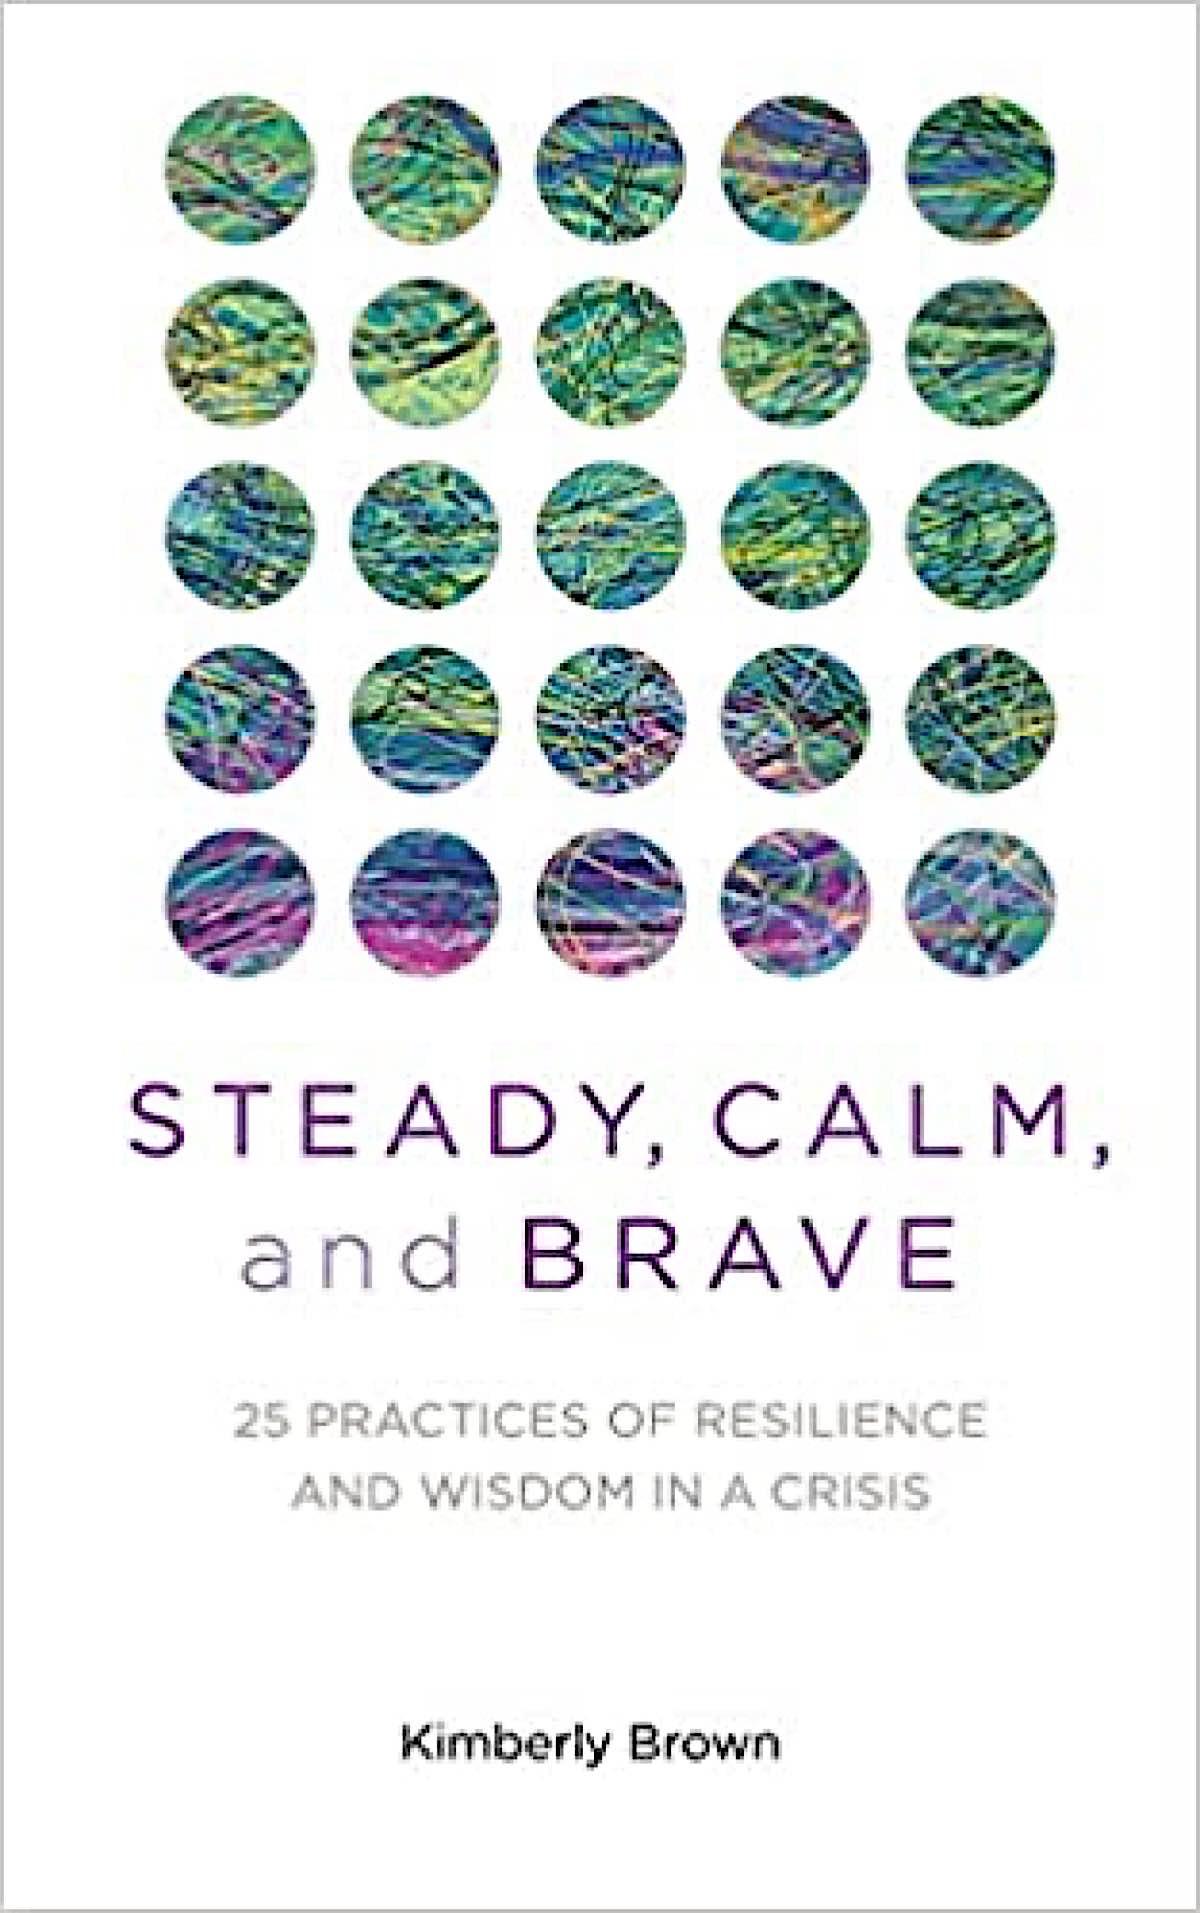 Buddha Weekly Steady calm brave book Buddhism